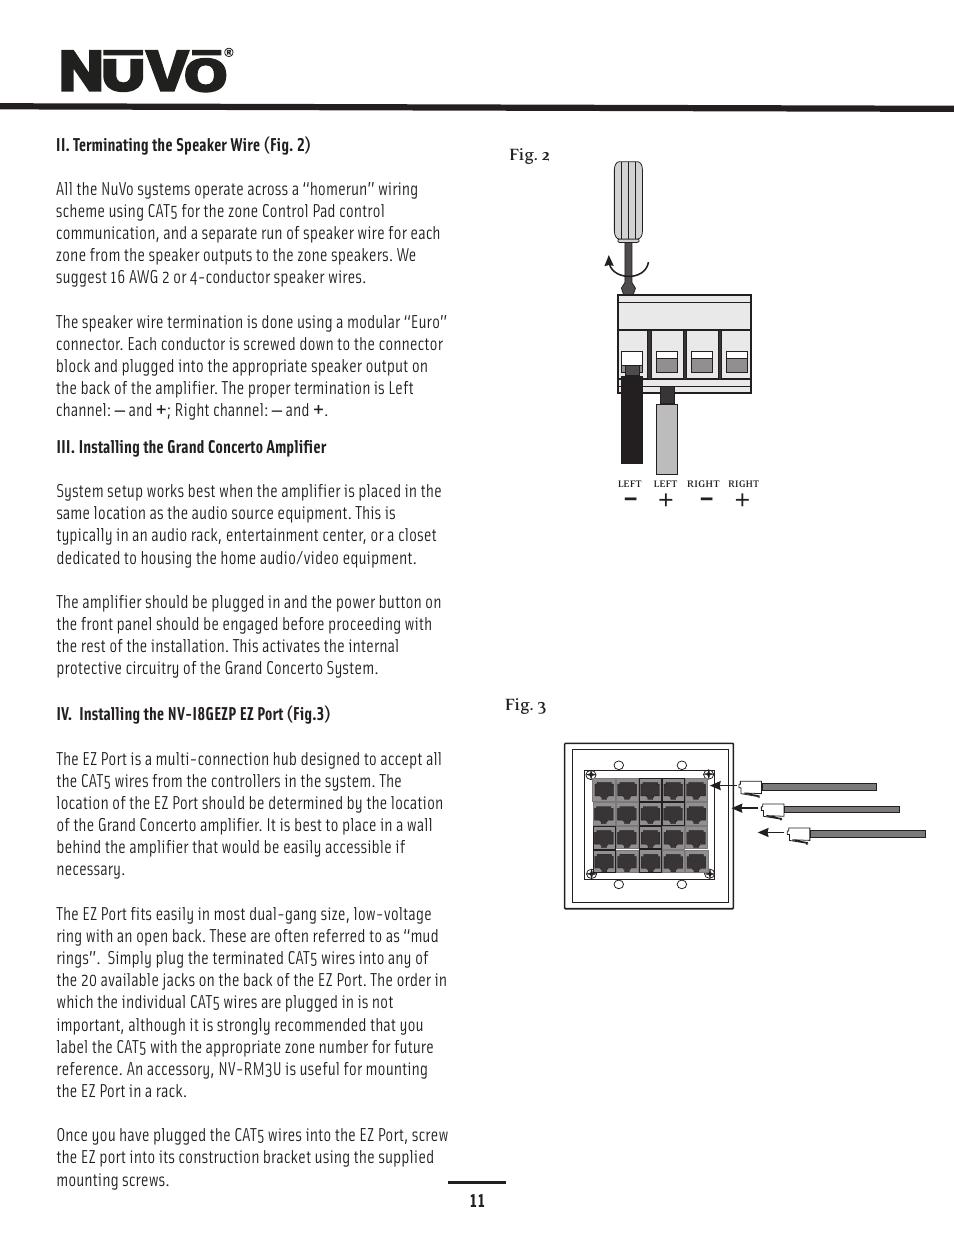 hight resolution of nuvo essentia nv e6gxs user manual page 15 48 also fornuvo essentia nv e6gxs user manual